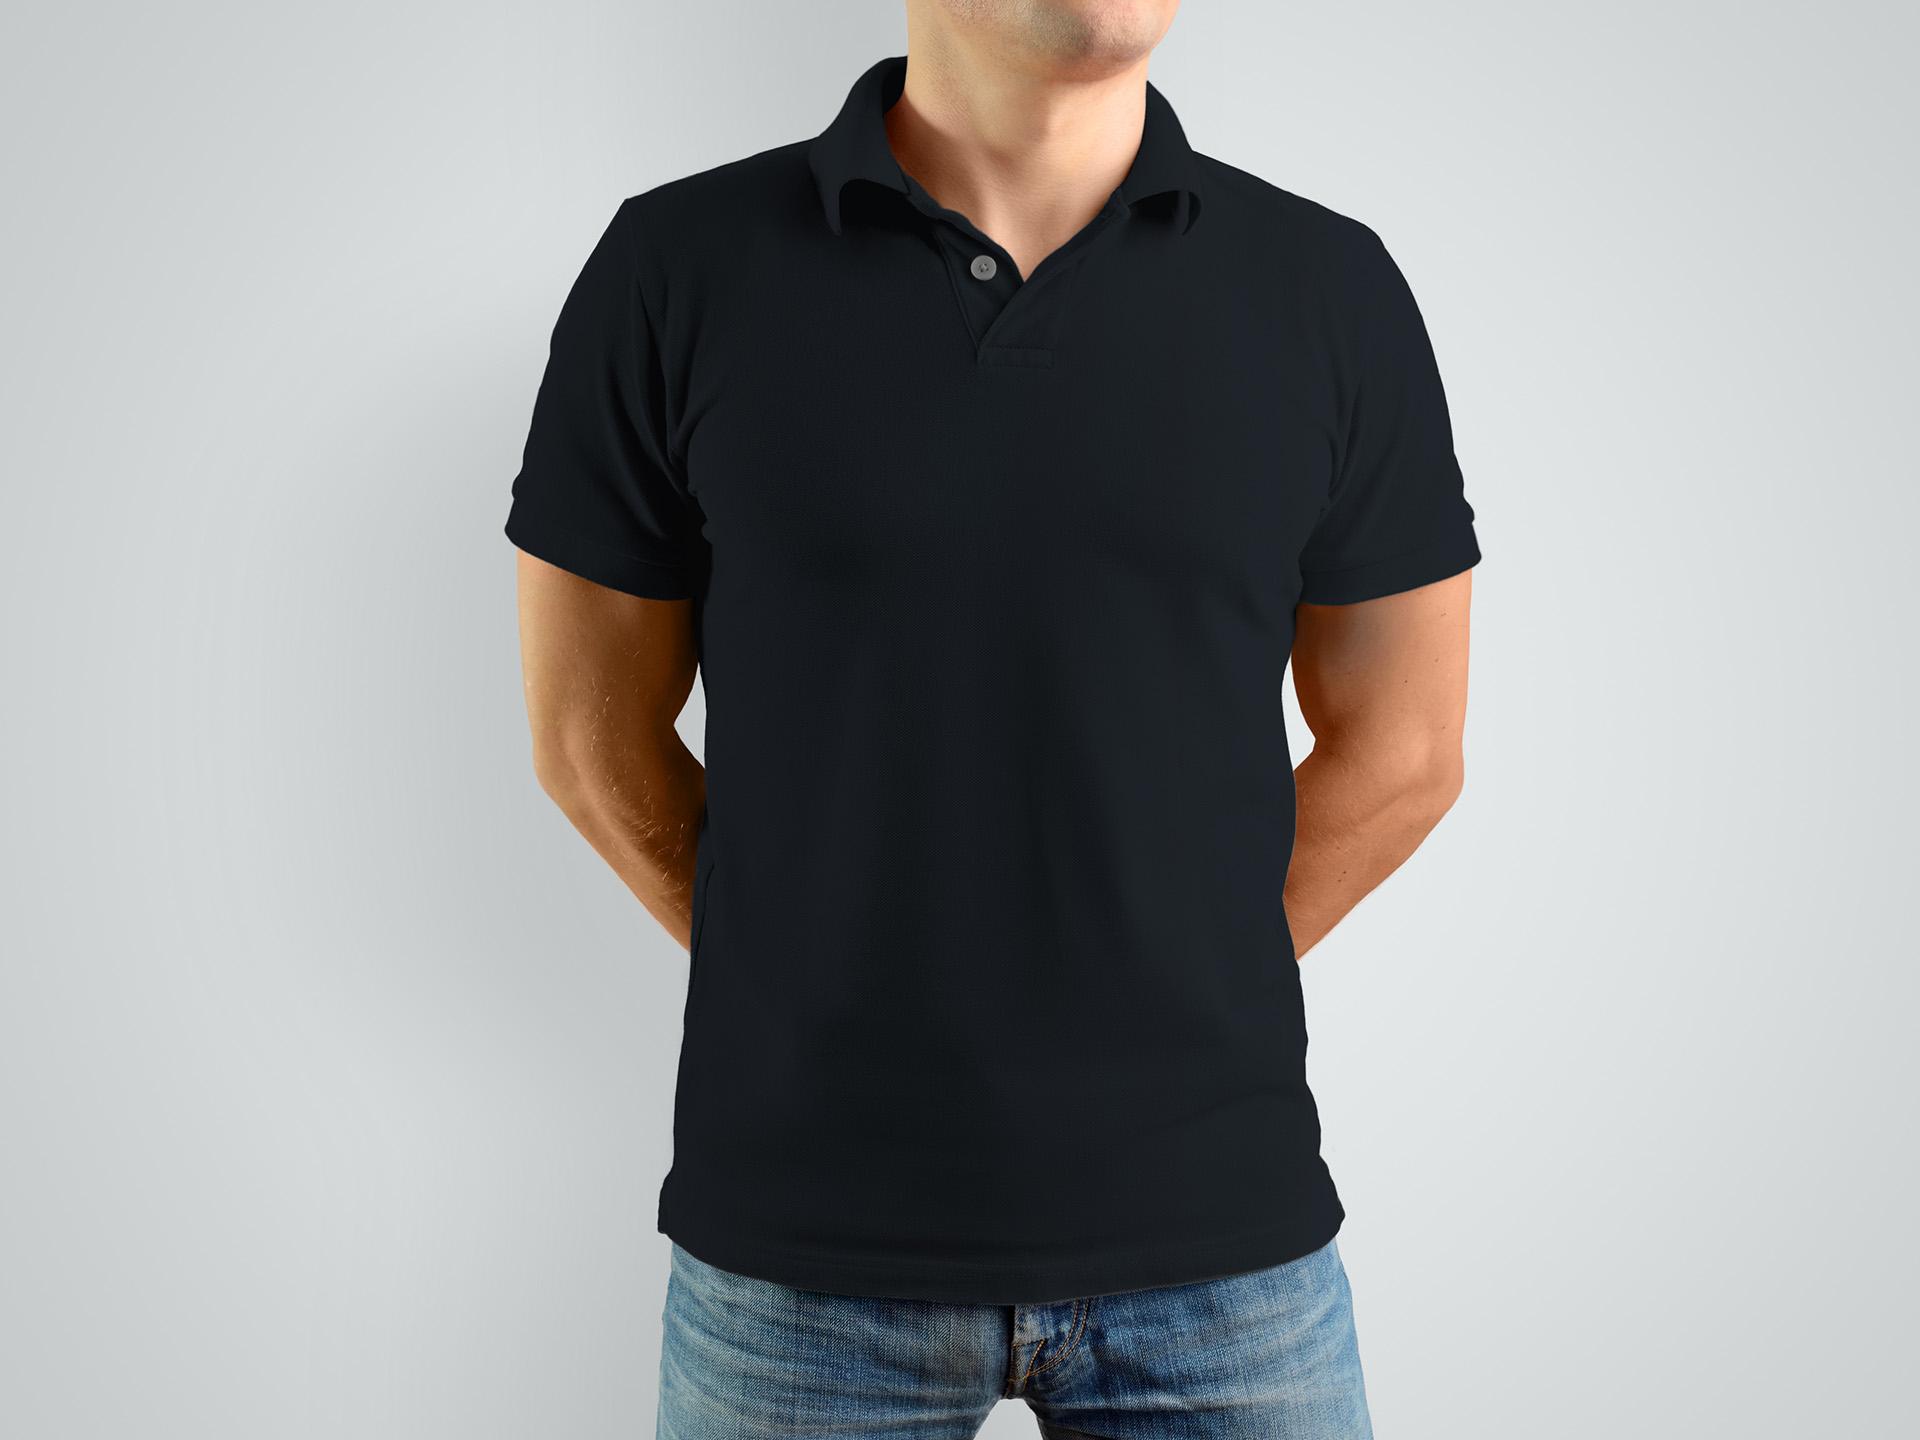 Få et tilbud på pique-skjorter